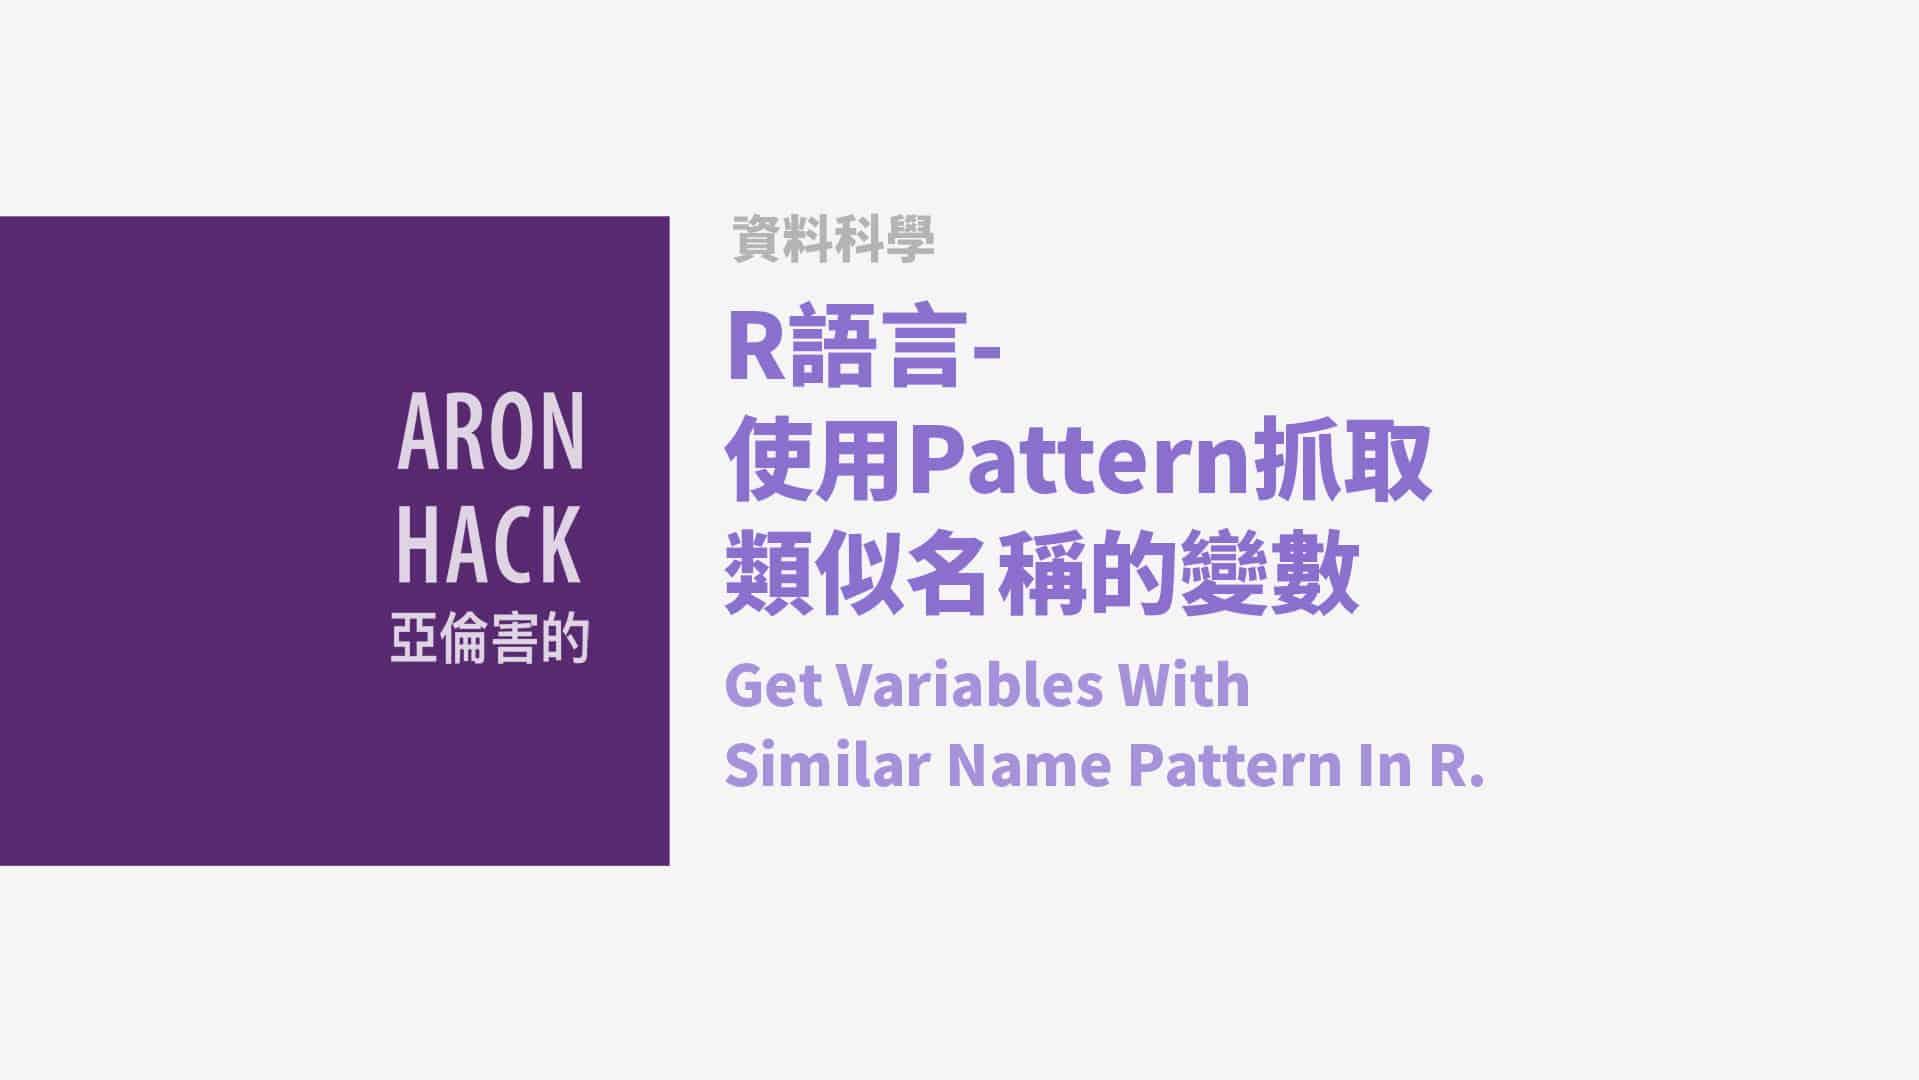 R語言- 使用Pattern抓取 類似名稱的變數